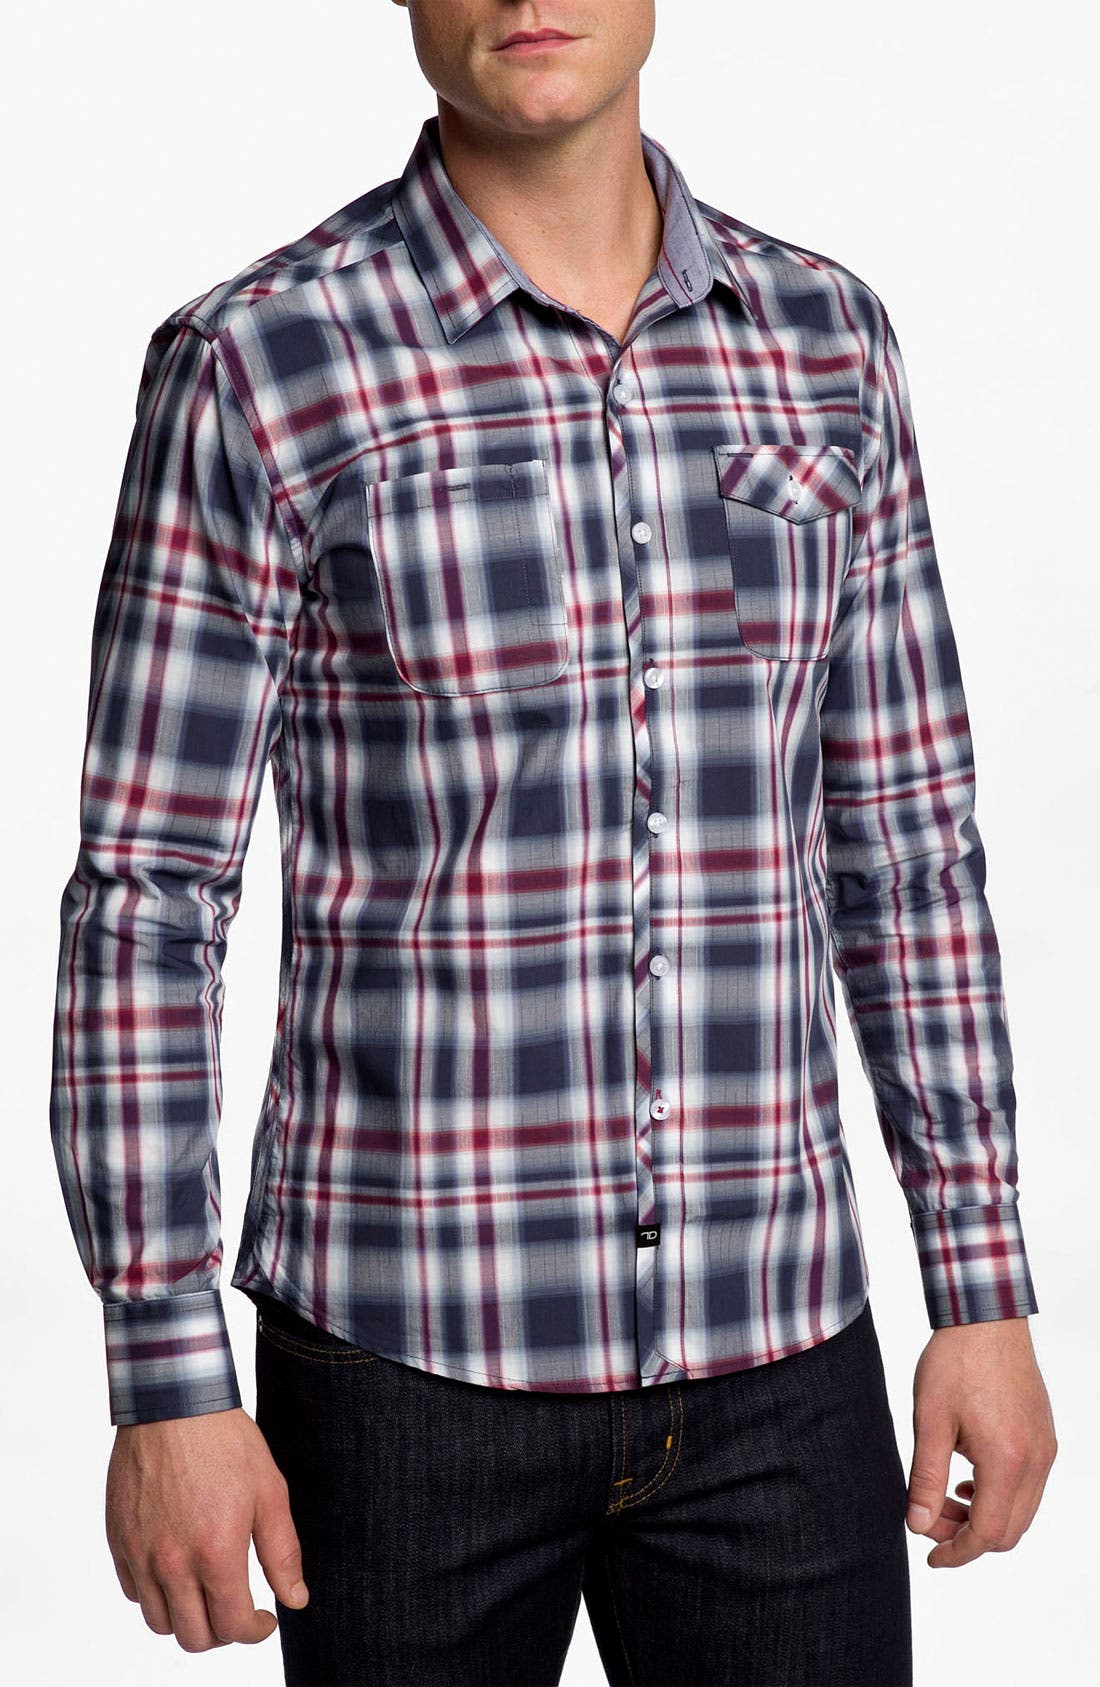 Main Image - 7 Diamonds 'Everyday Shelter' Plaid Trim Fit Cotton Sport Shirt